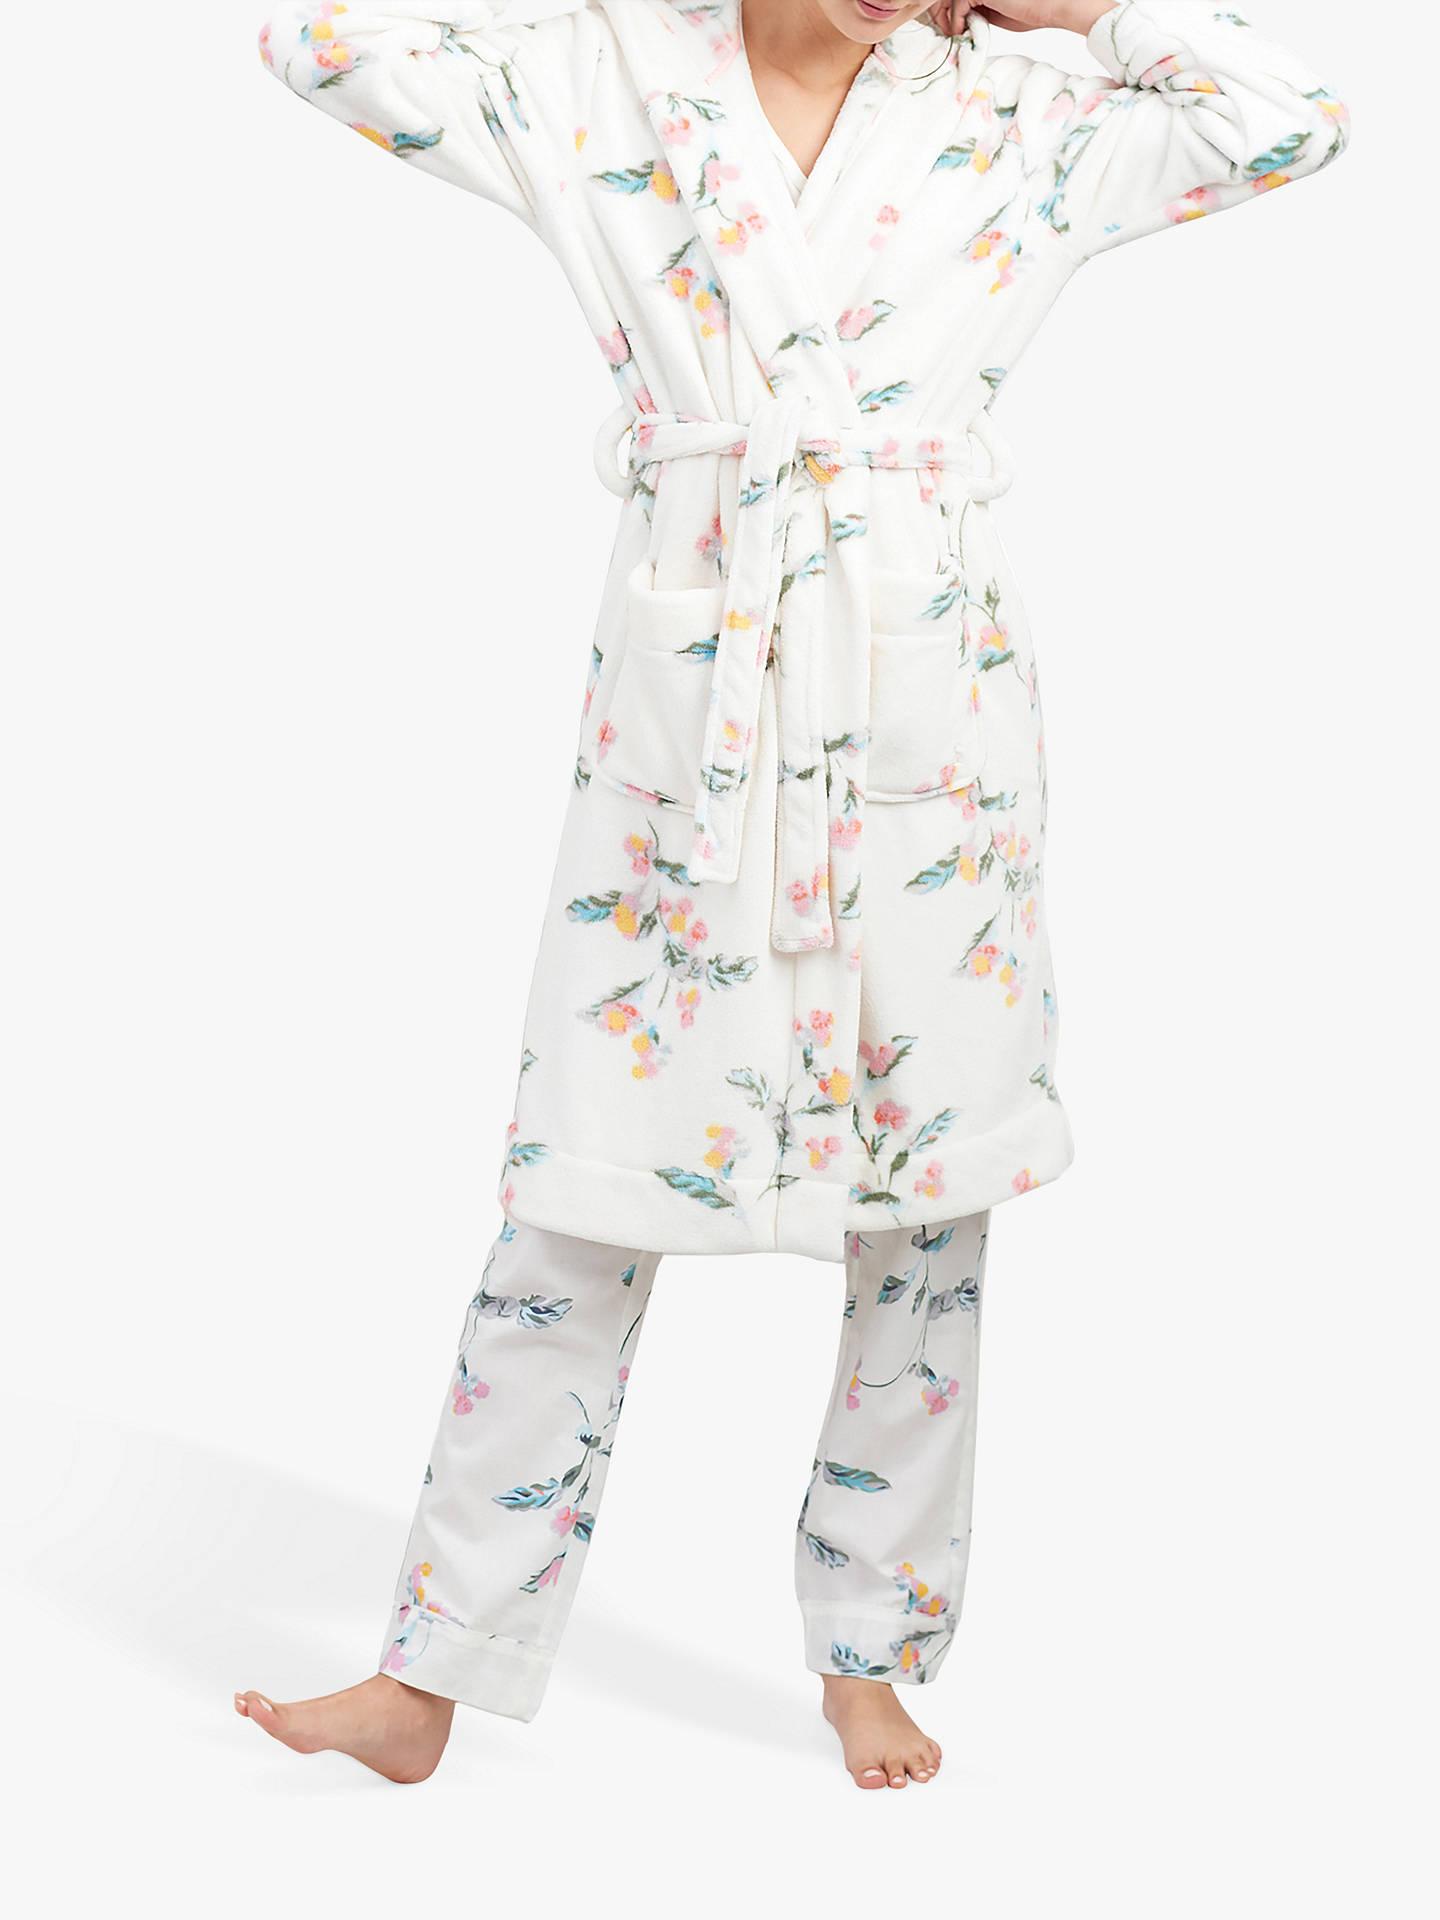 Joules Rita Floral Print Fleece Dressing Gown Cream At John Lewis